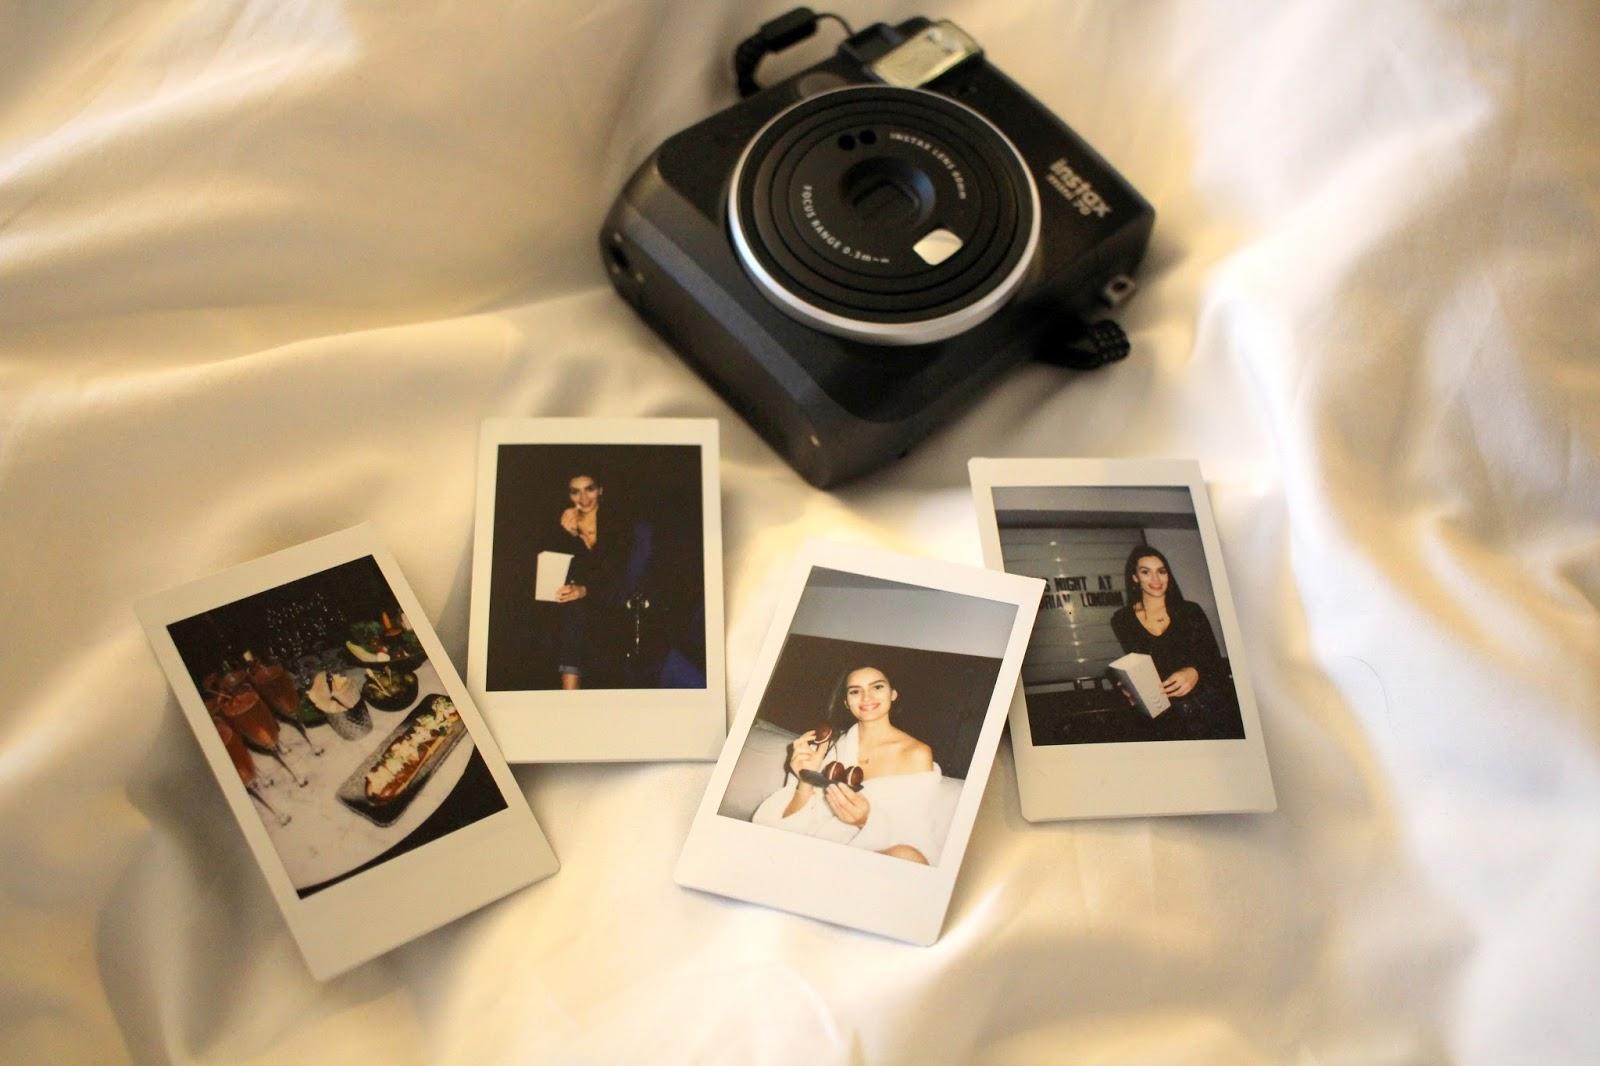 instax polaroid photos peexo blog